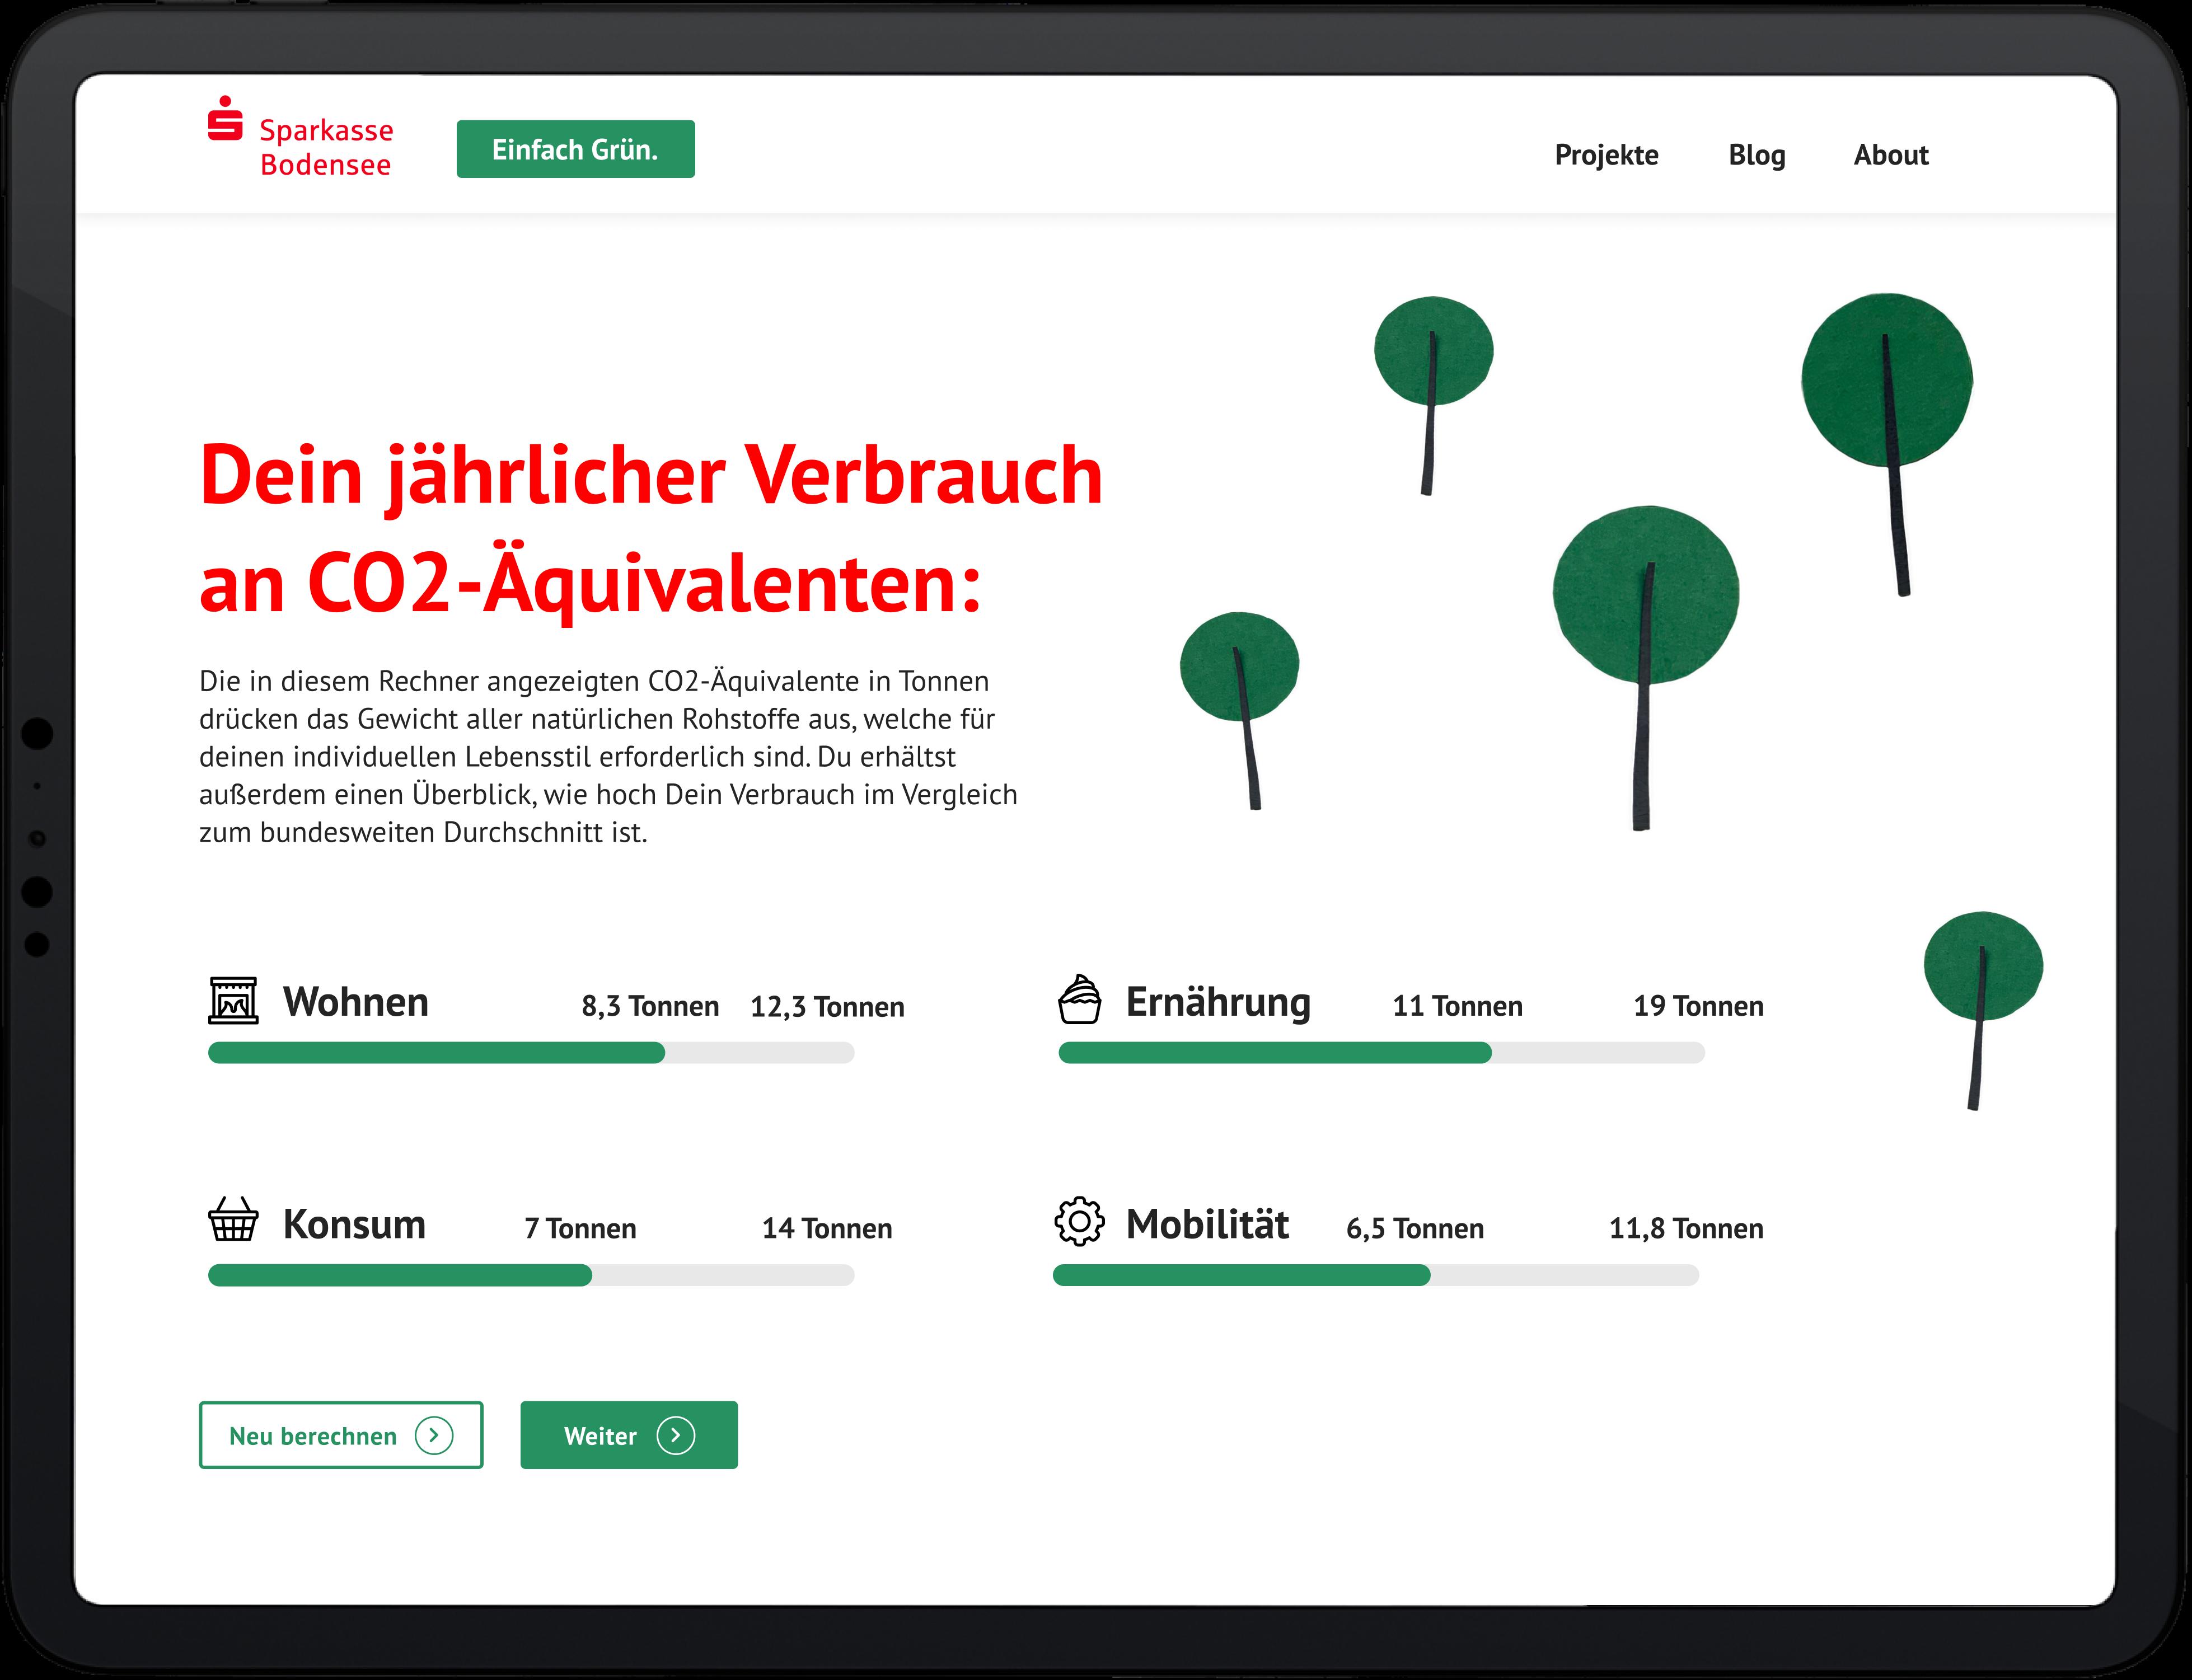 Nachhaltigkeitsplattform Sparkasse Bodensee - Mockup CO2 Rechner